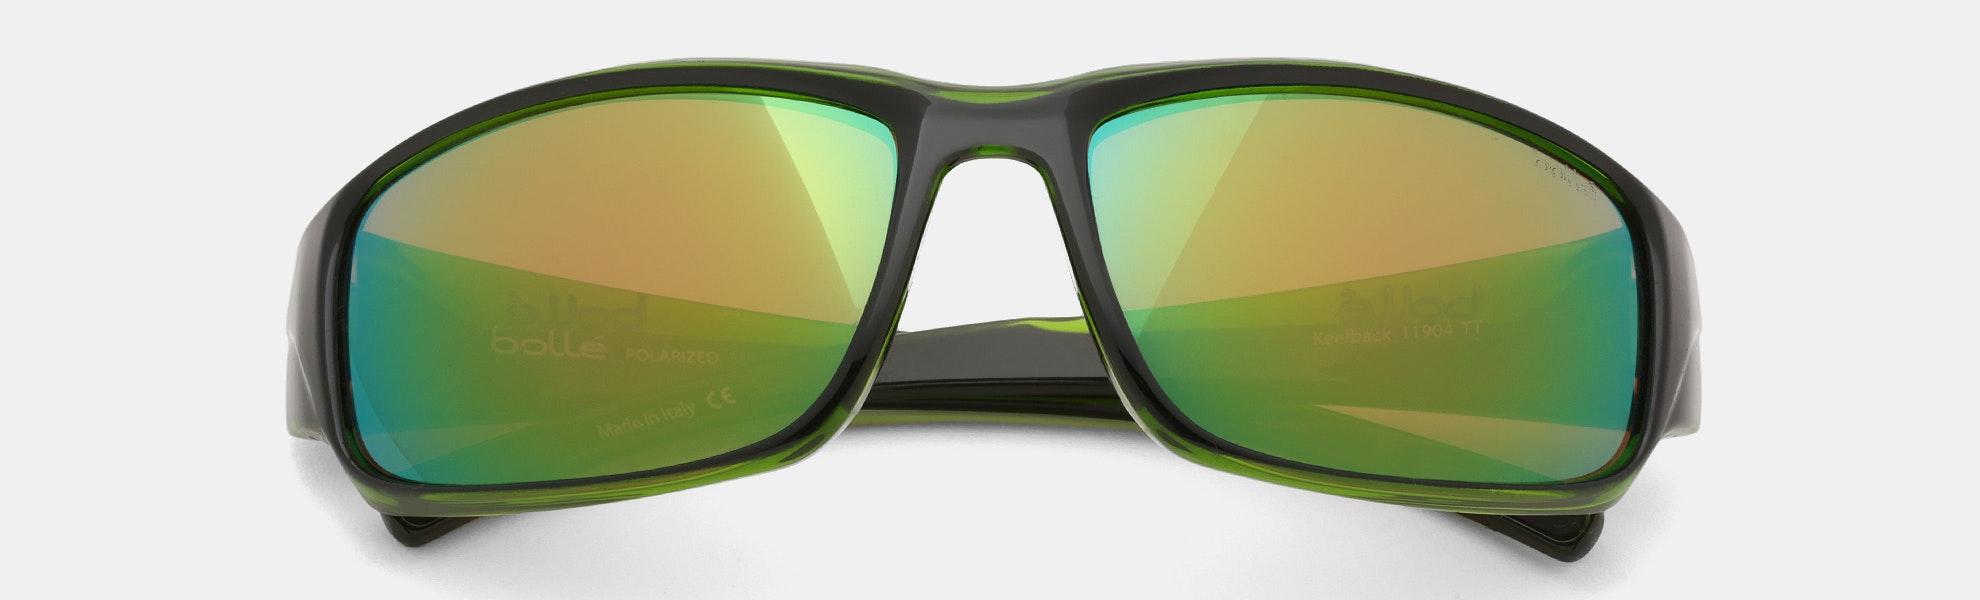 Bolle Keelback Polarized Sunglasses